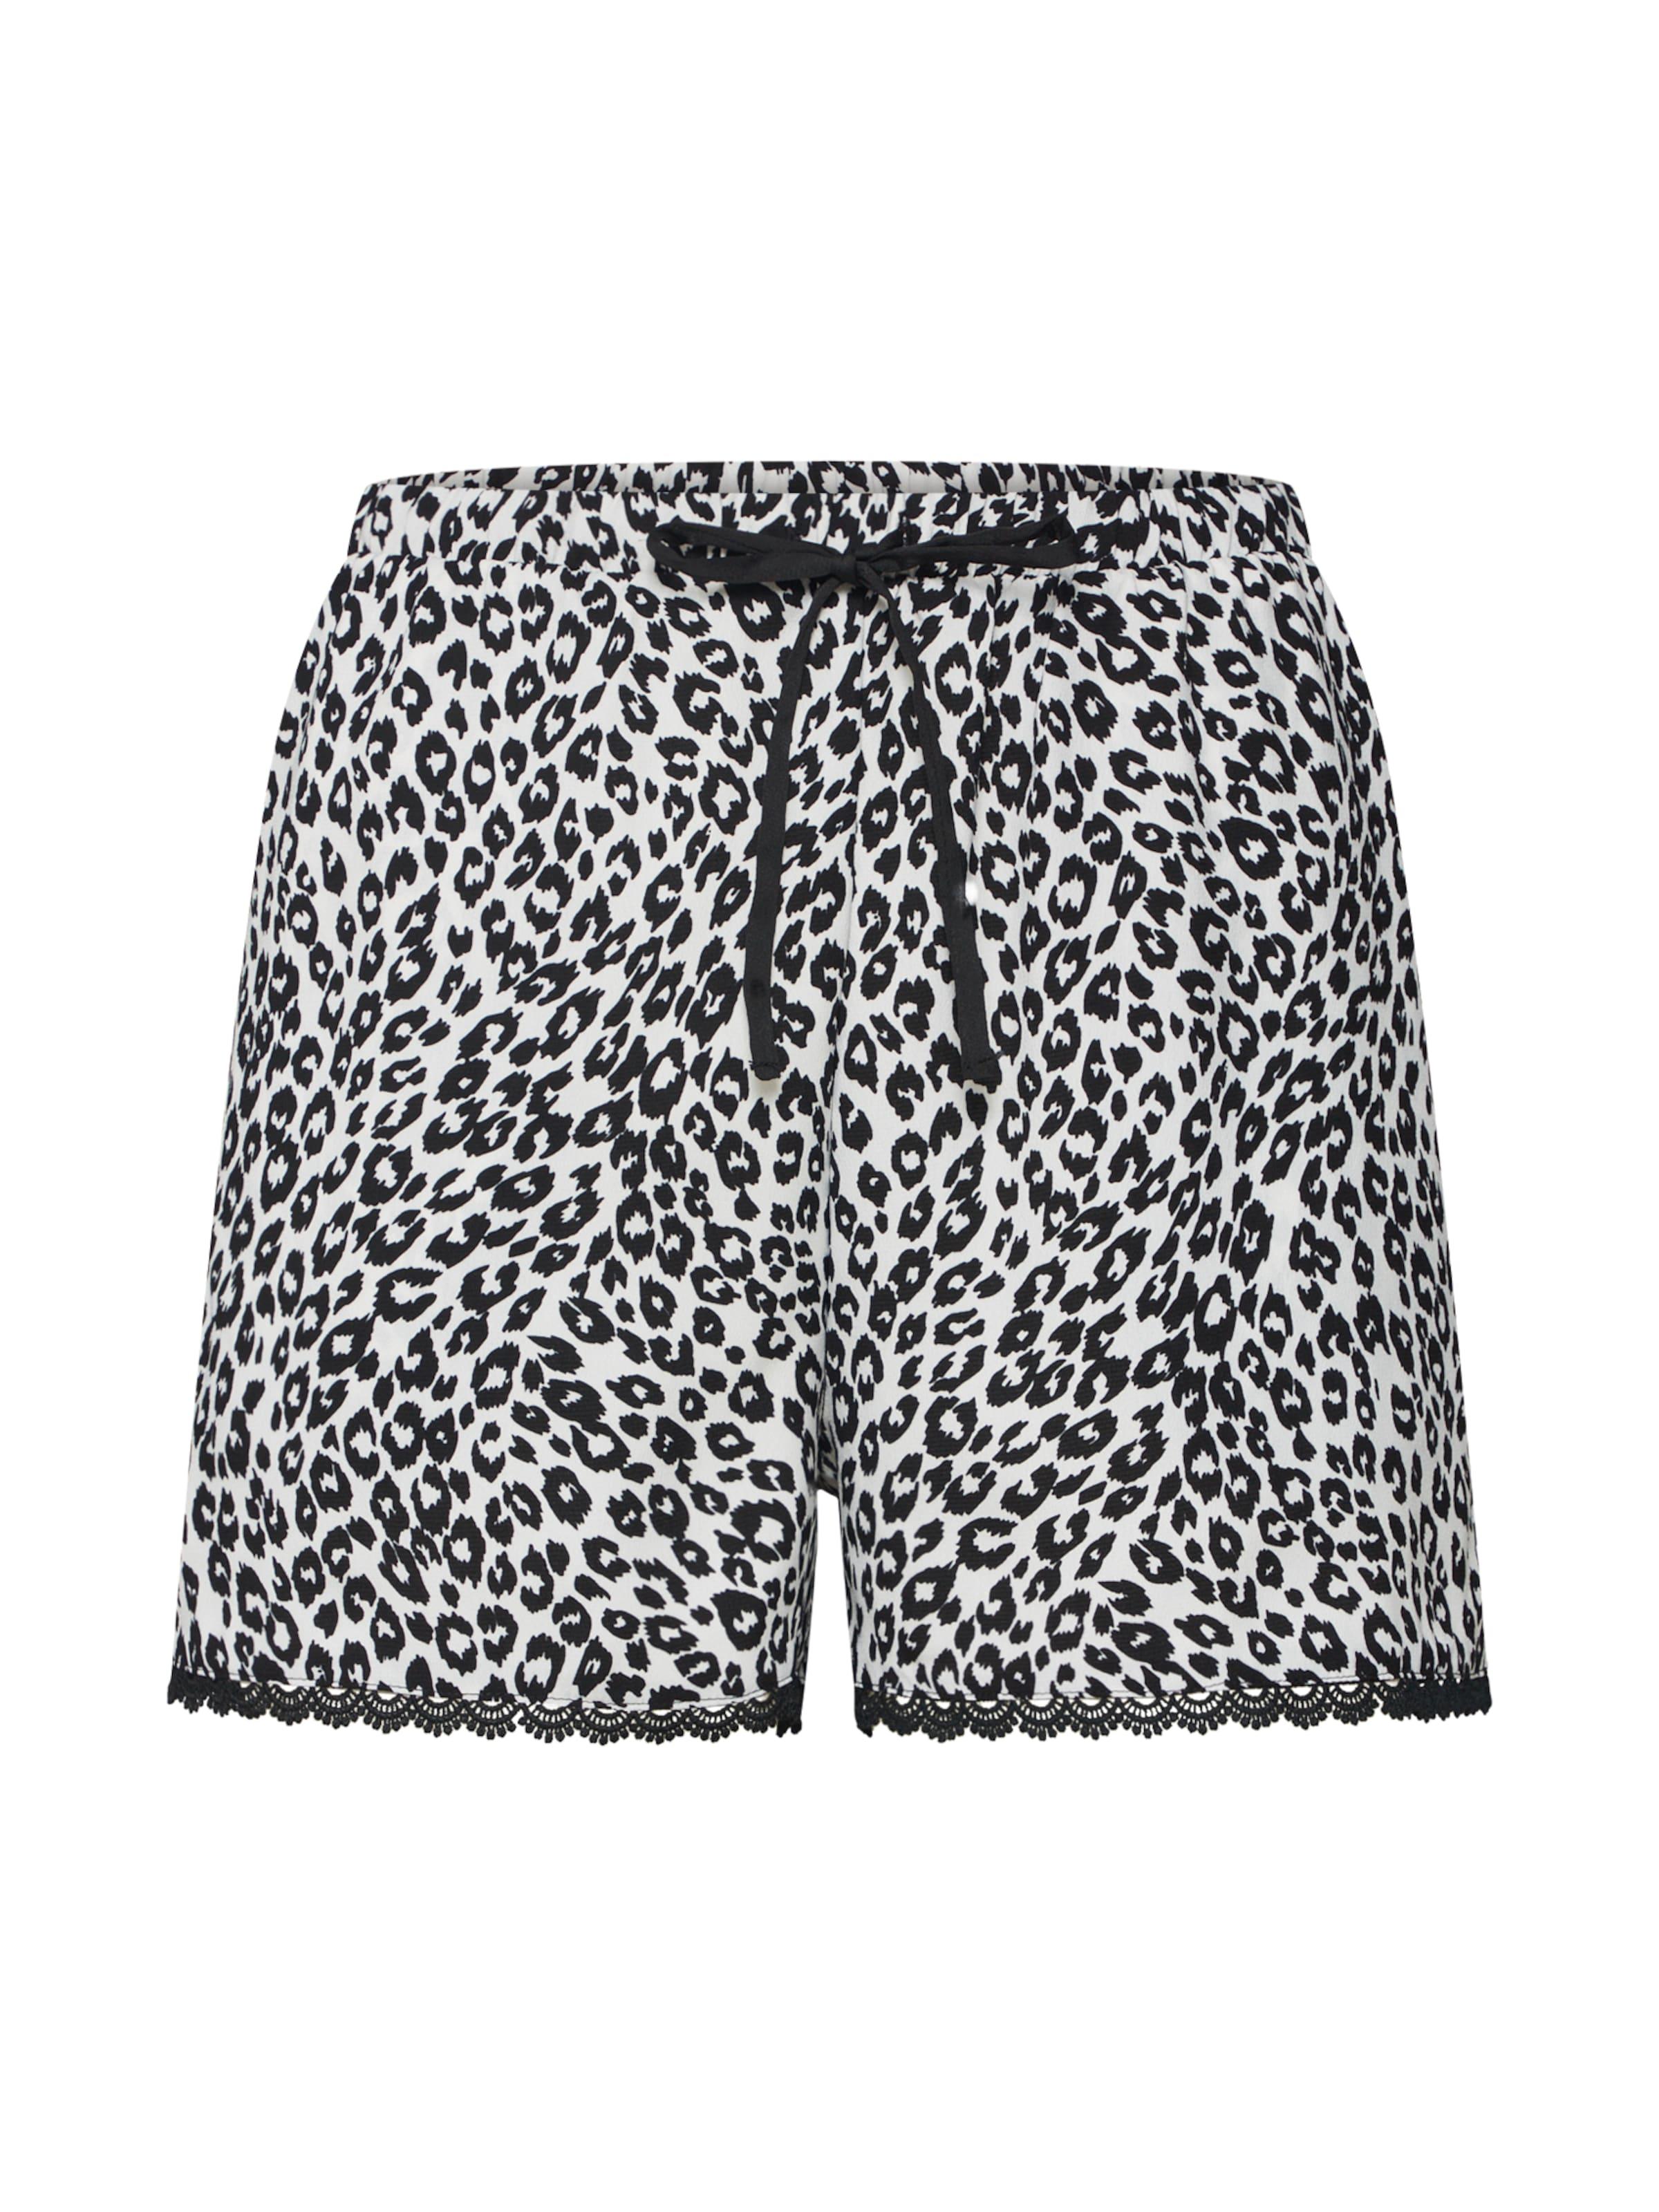 Vila Couleurs Pantalon De 'niall Tiana' En BeigeMélange Pyjama T1c3FKJul